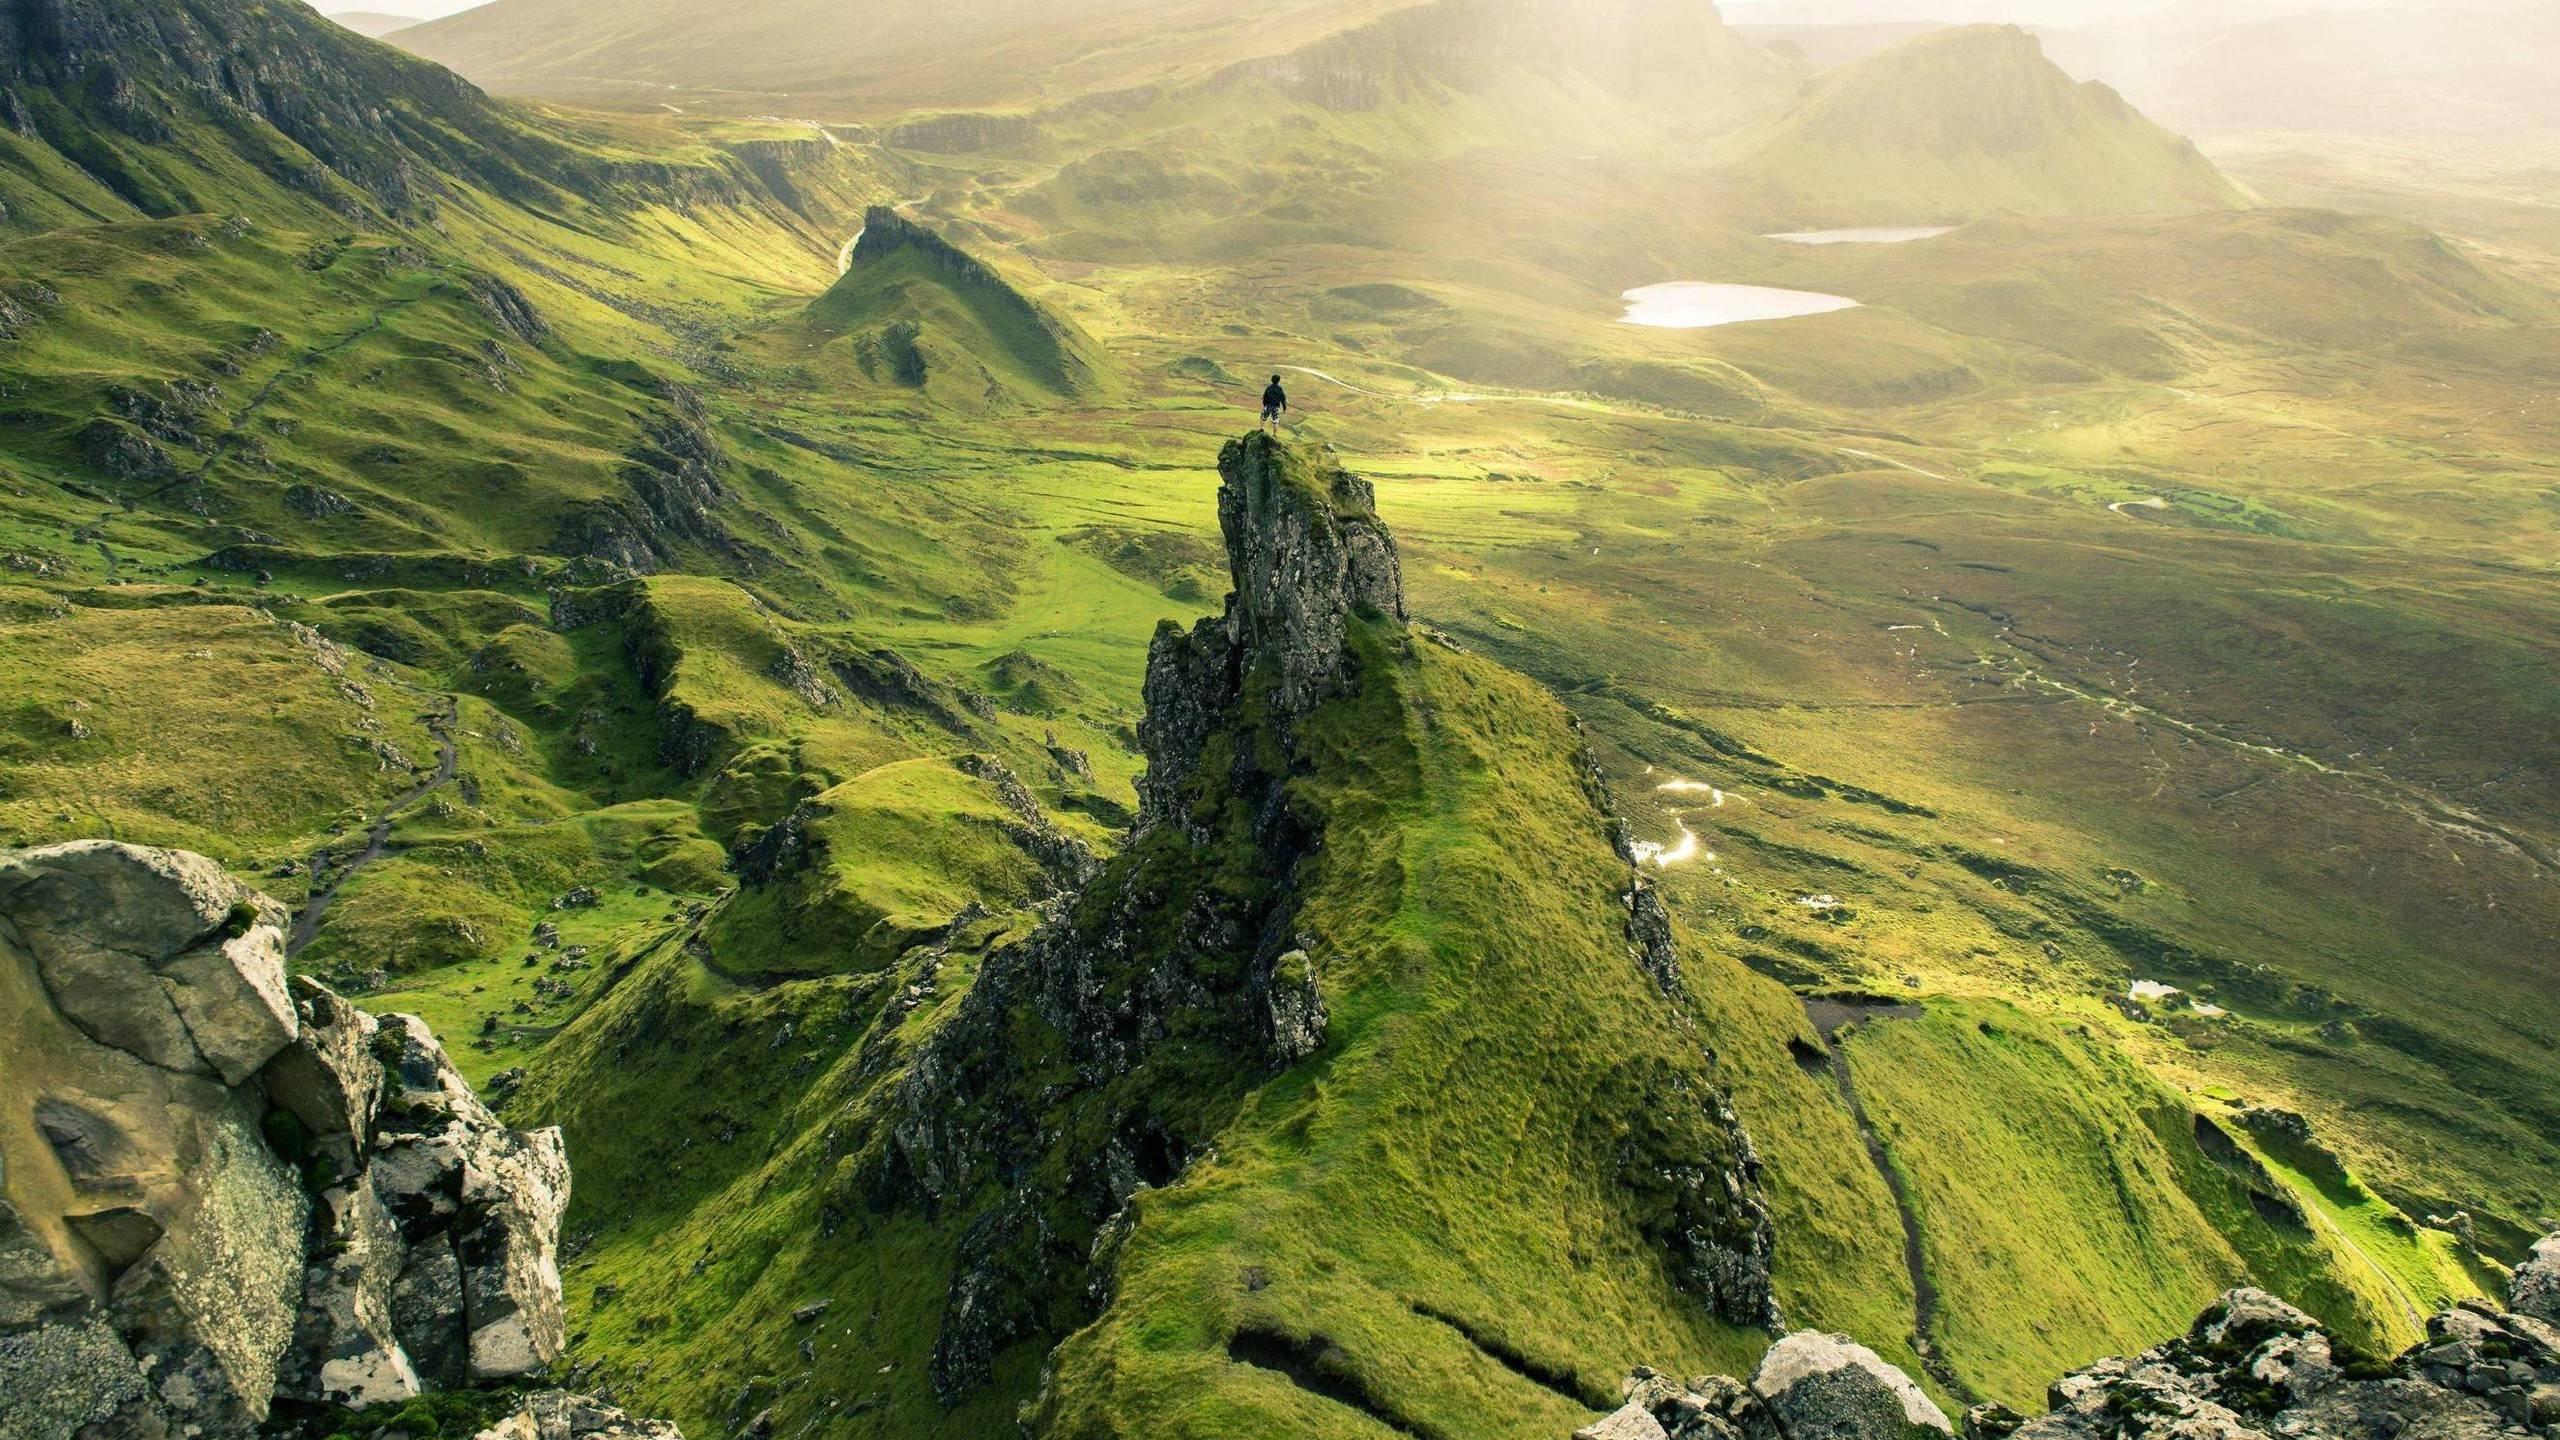 Quiraing Area Of The Isle Of Skye Hd Wallpaper